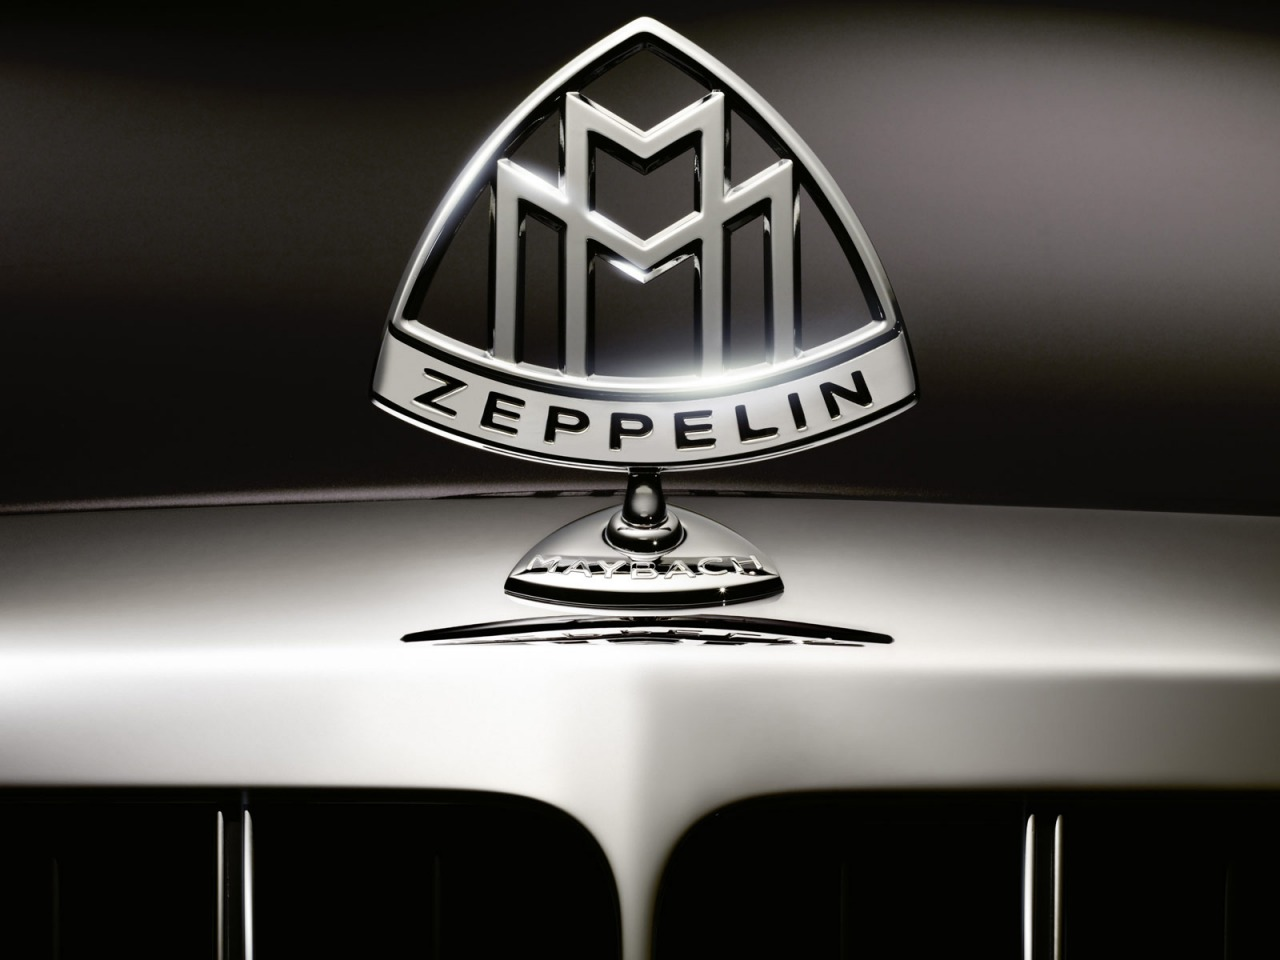 Maybach zeppelin logo wallpaper maybach cars wallpapers in - Car logo wallpapers ...